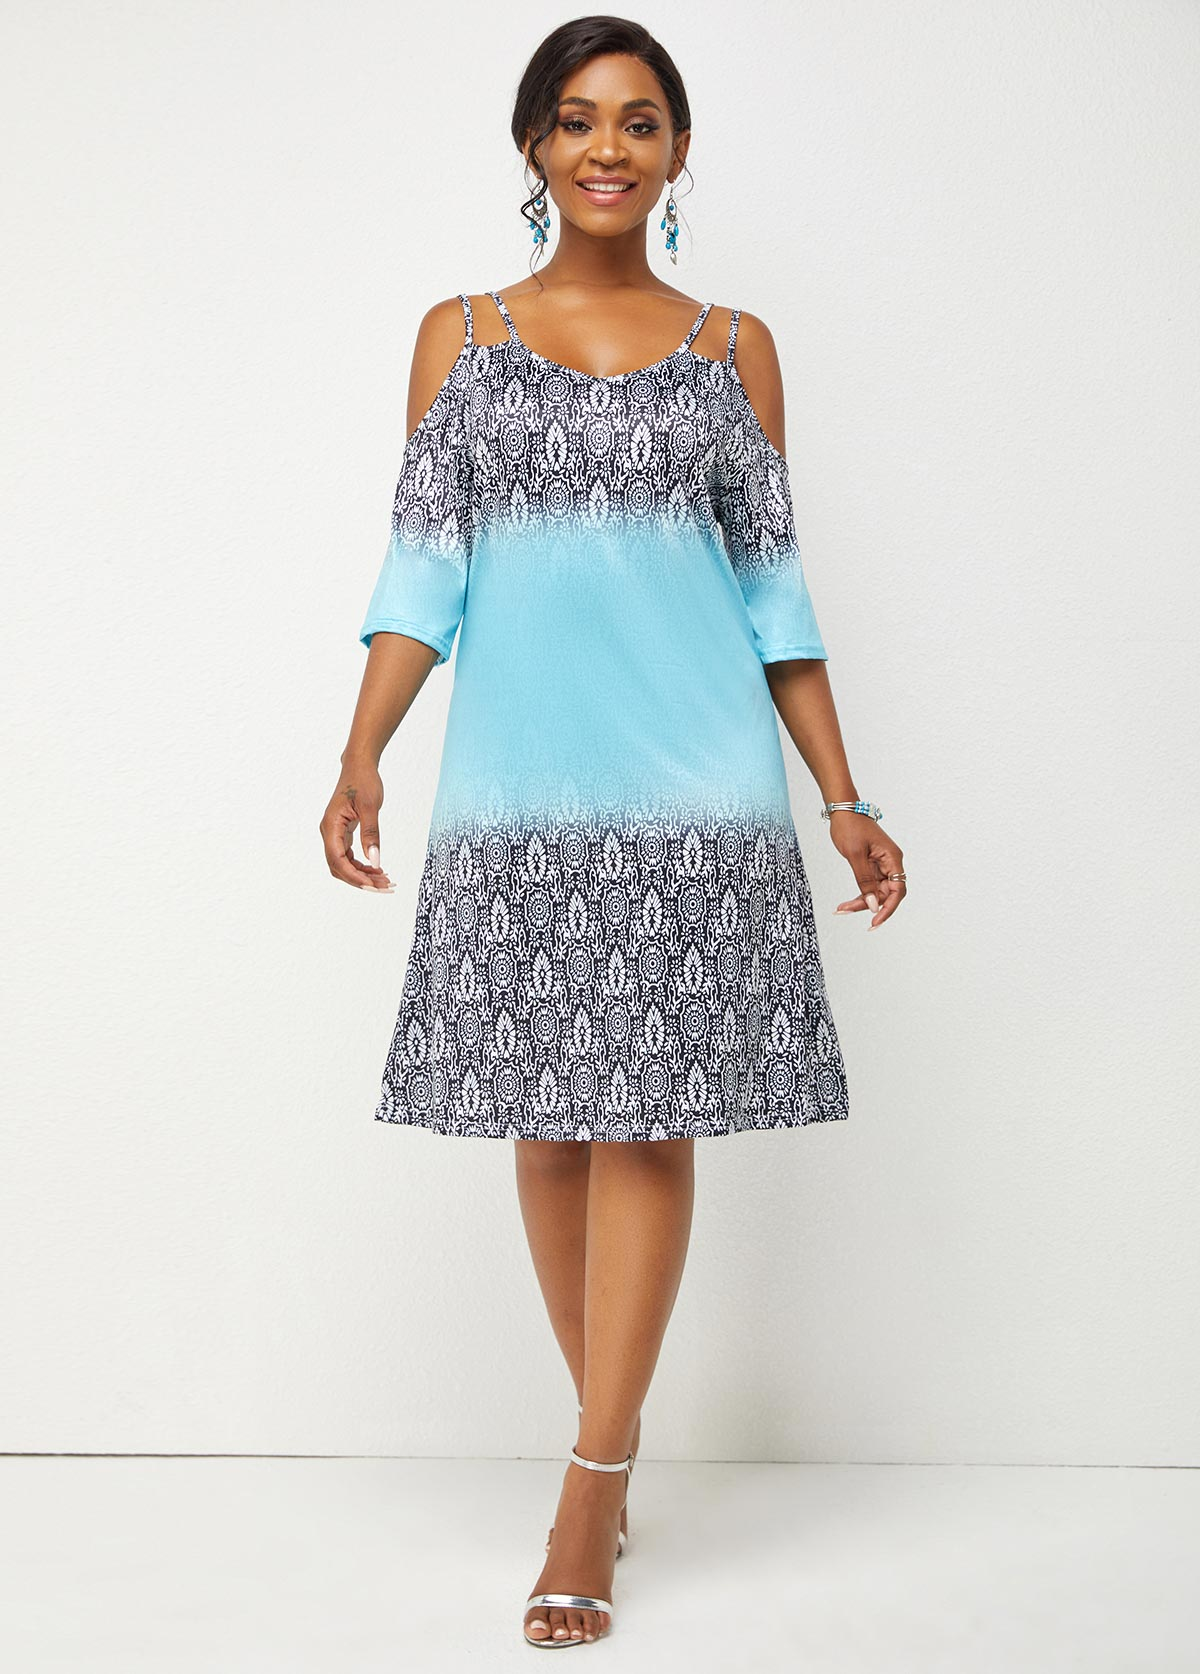 Printed Spaghetti Strap 3/4 Sleeve Dress